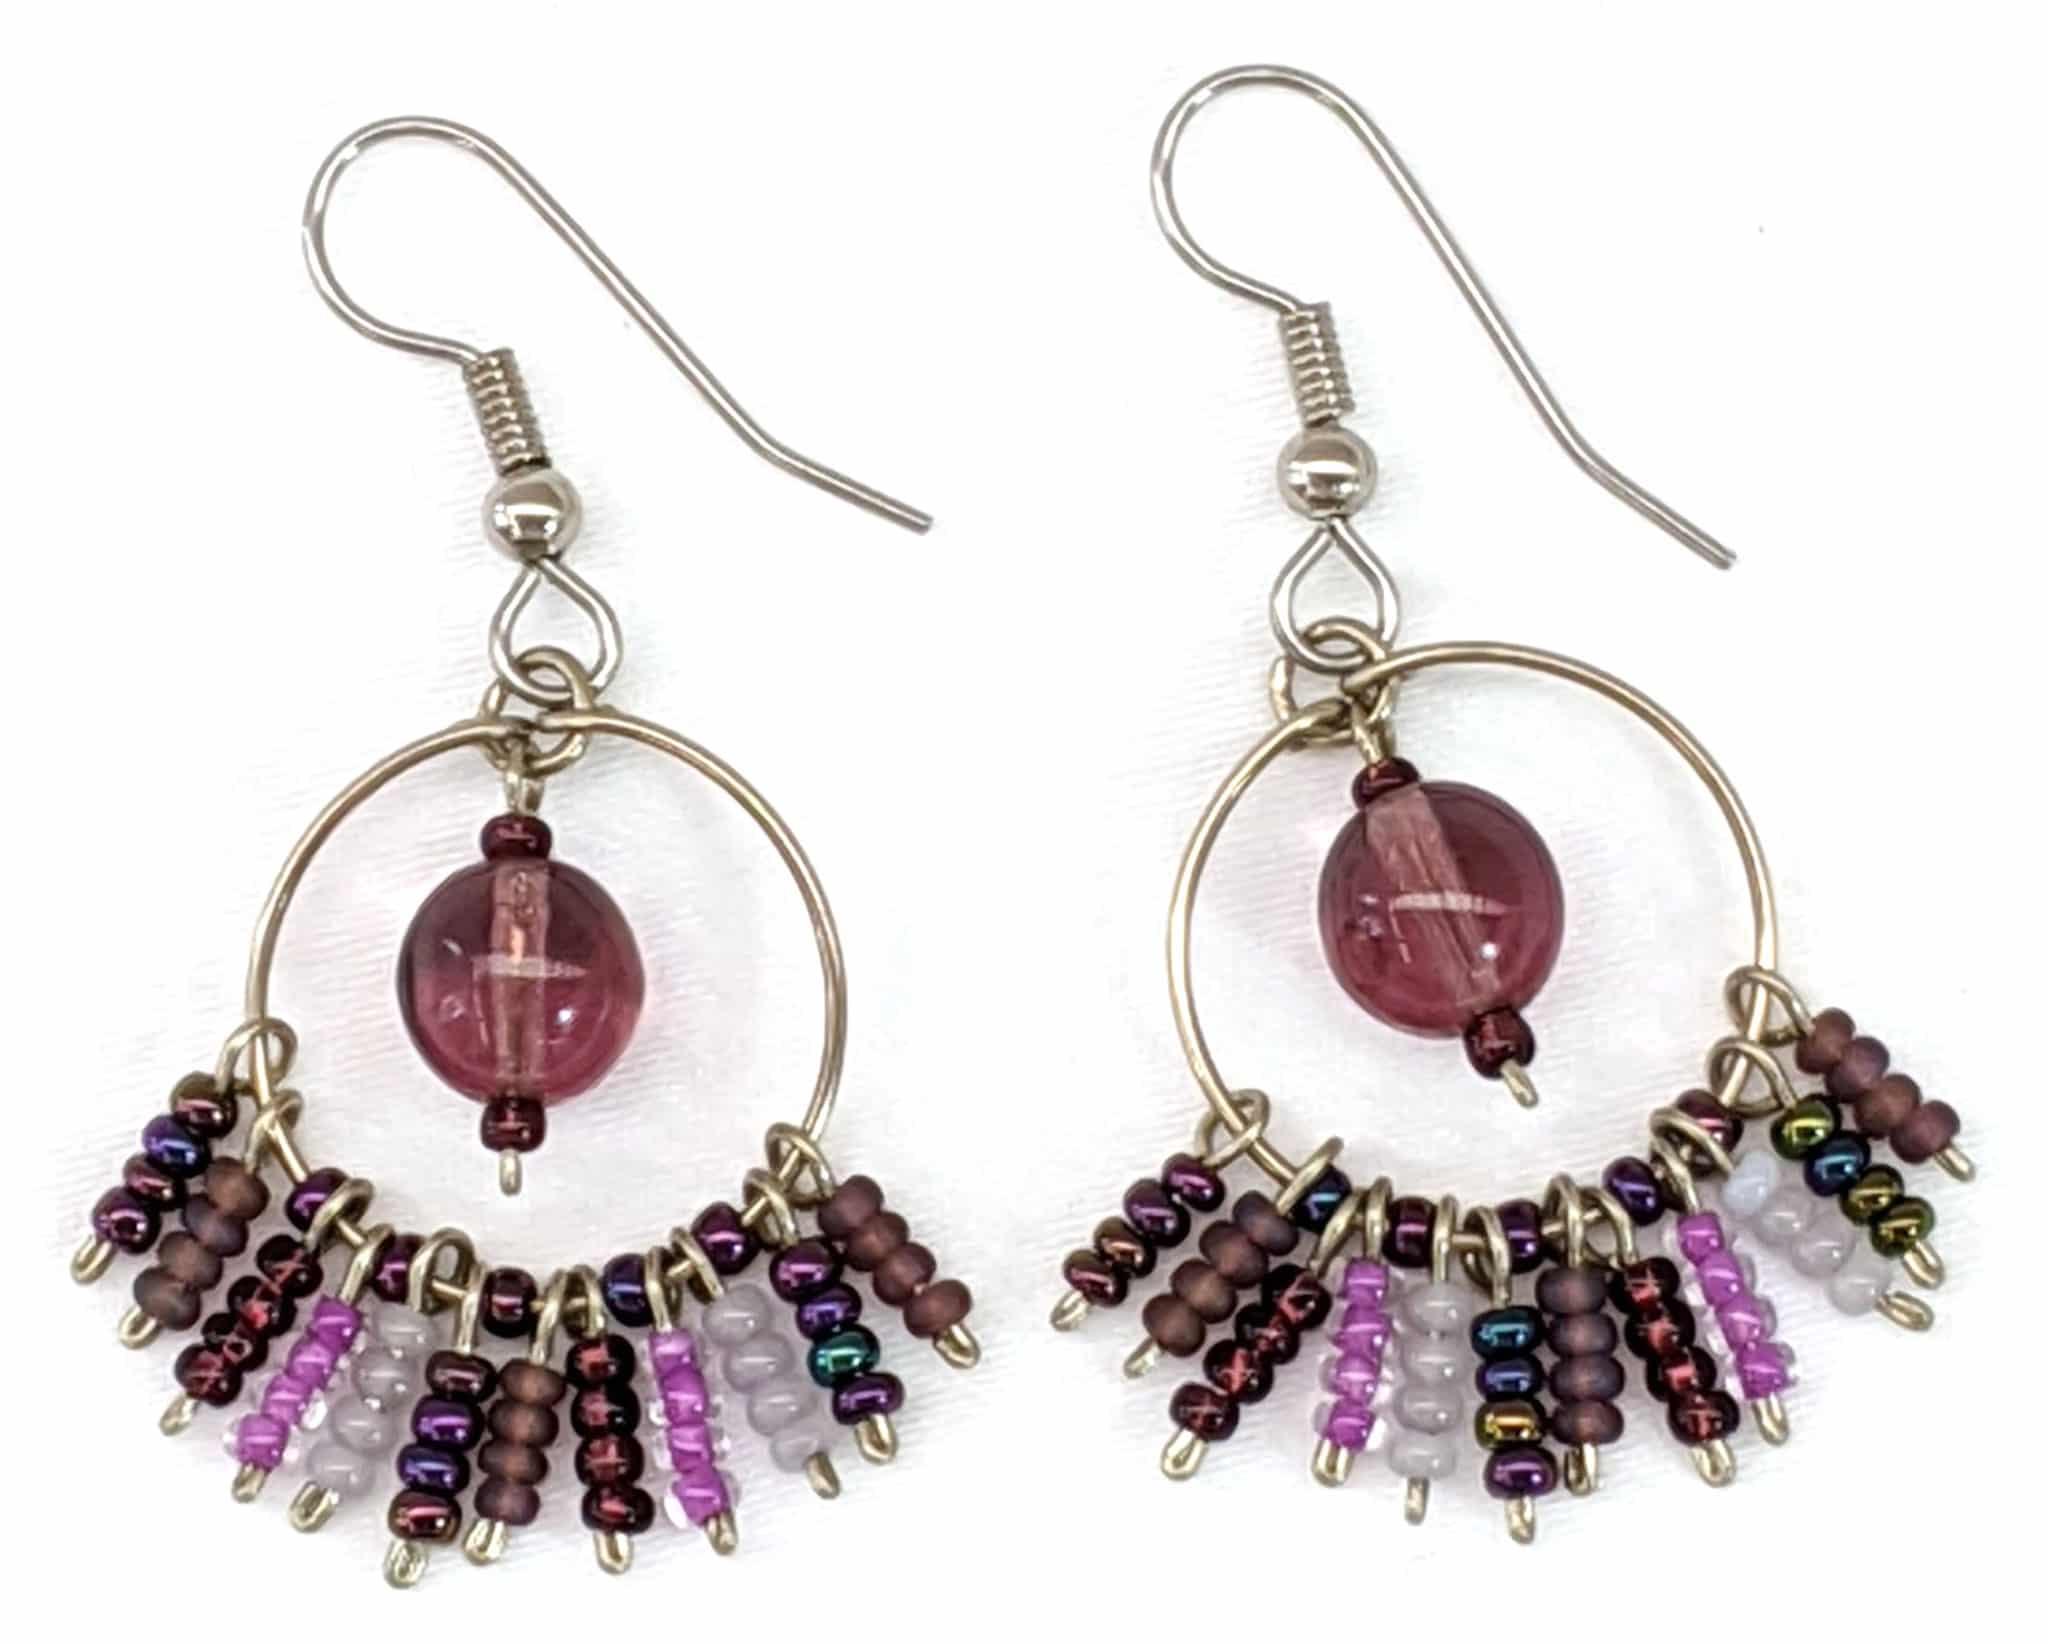 Circle Fringe Beaded Earrings - Purples